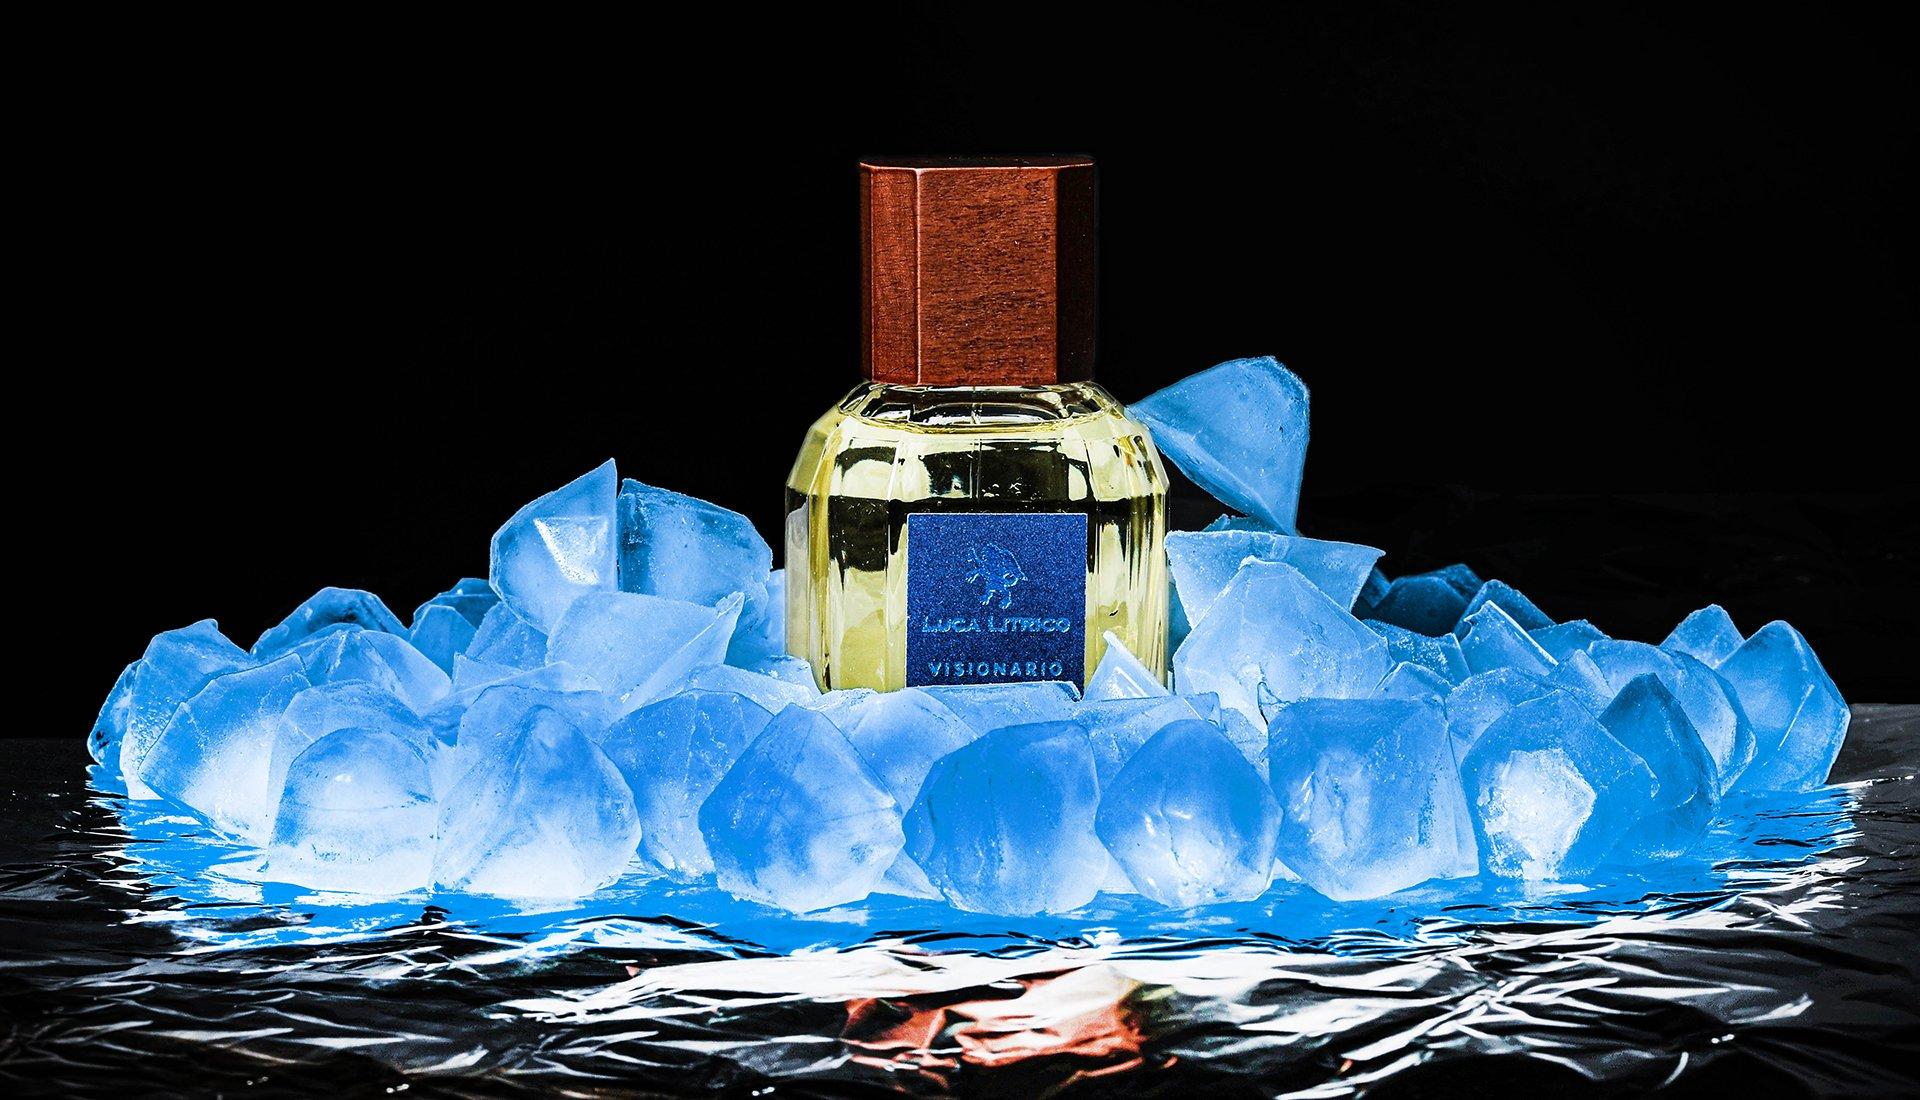 perfume - visionario - luca litrico